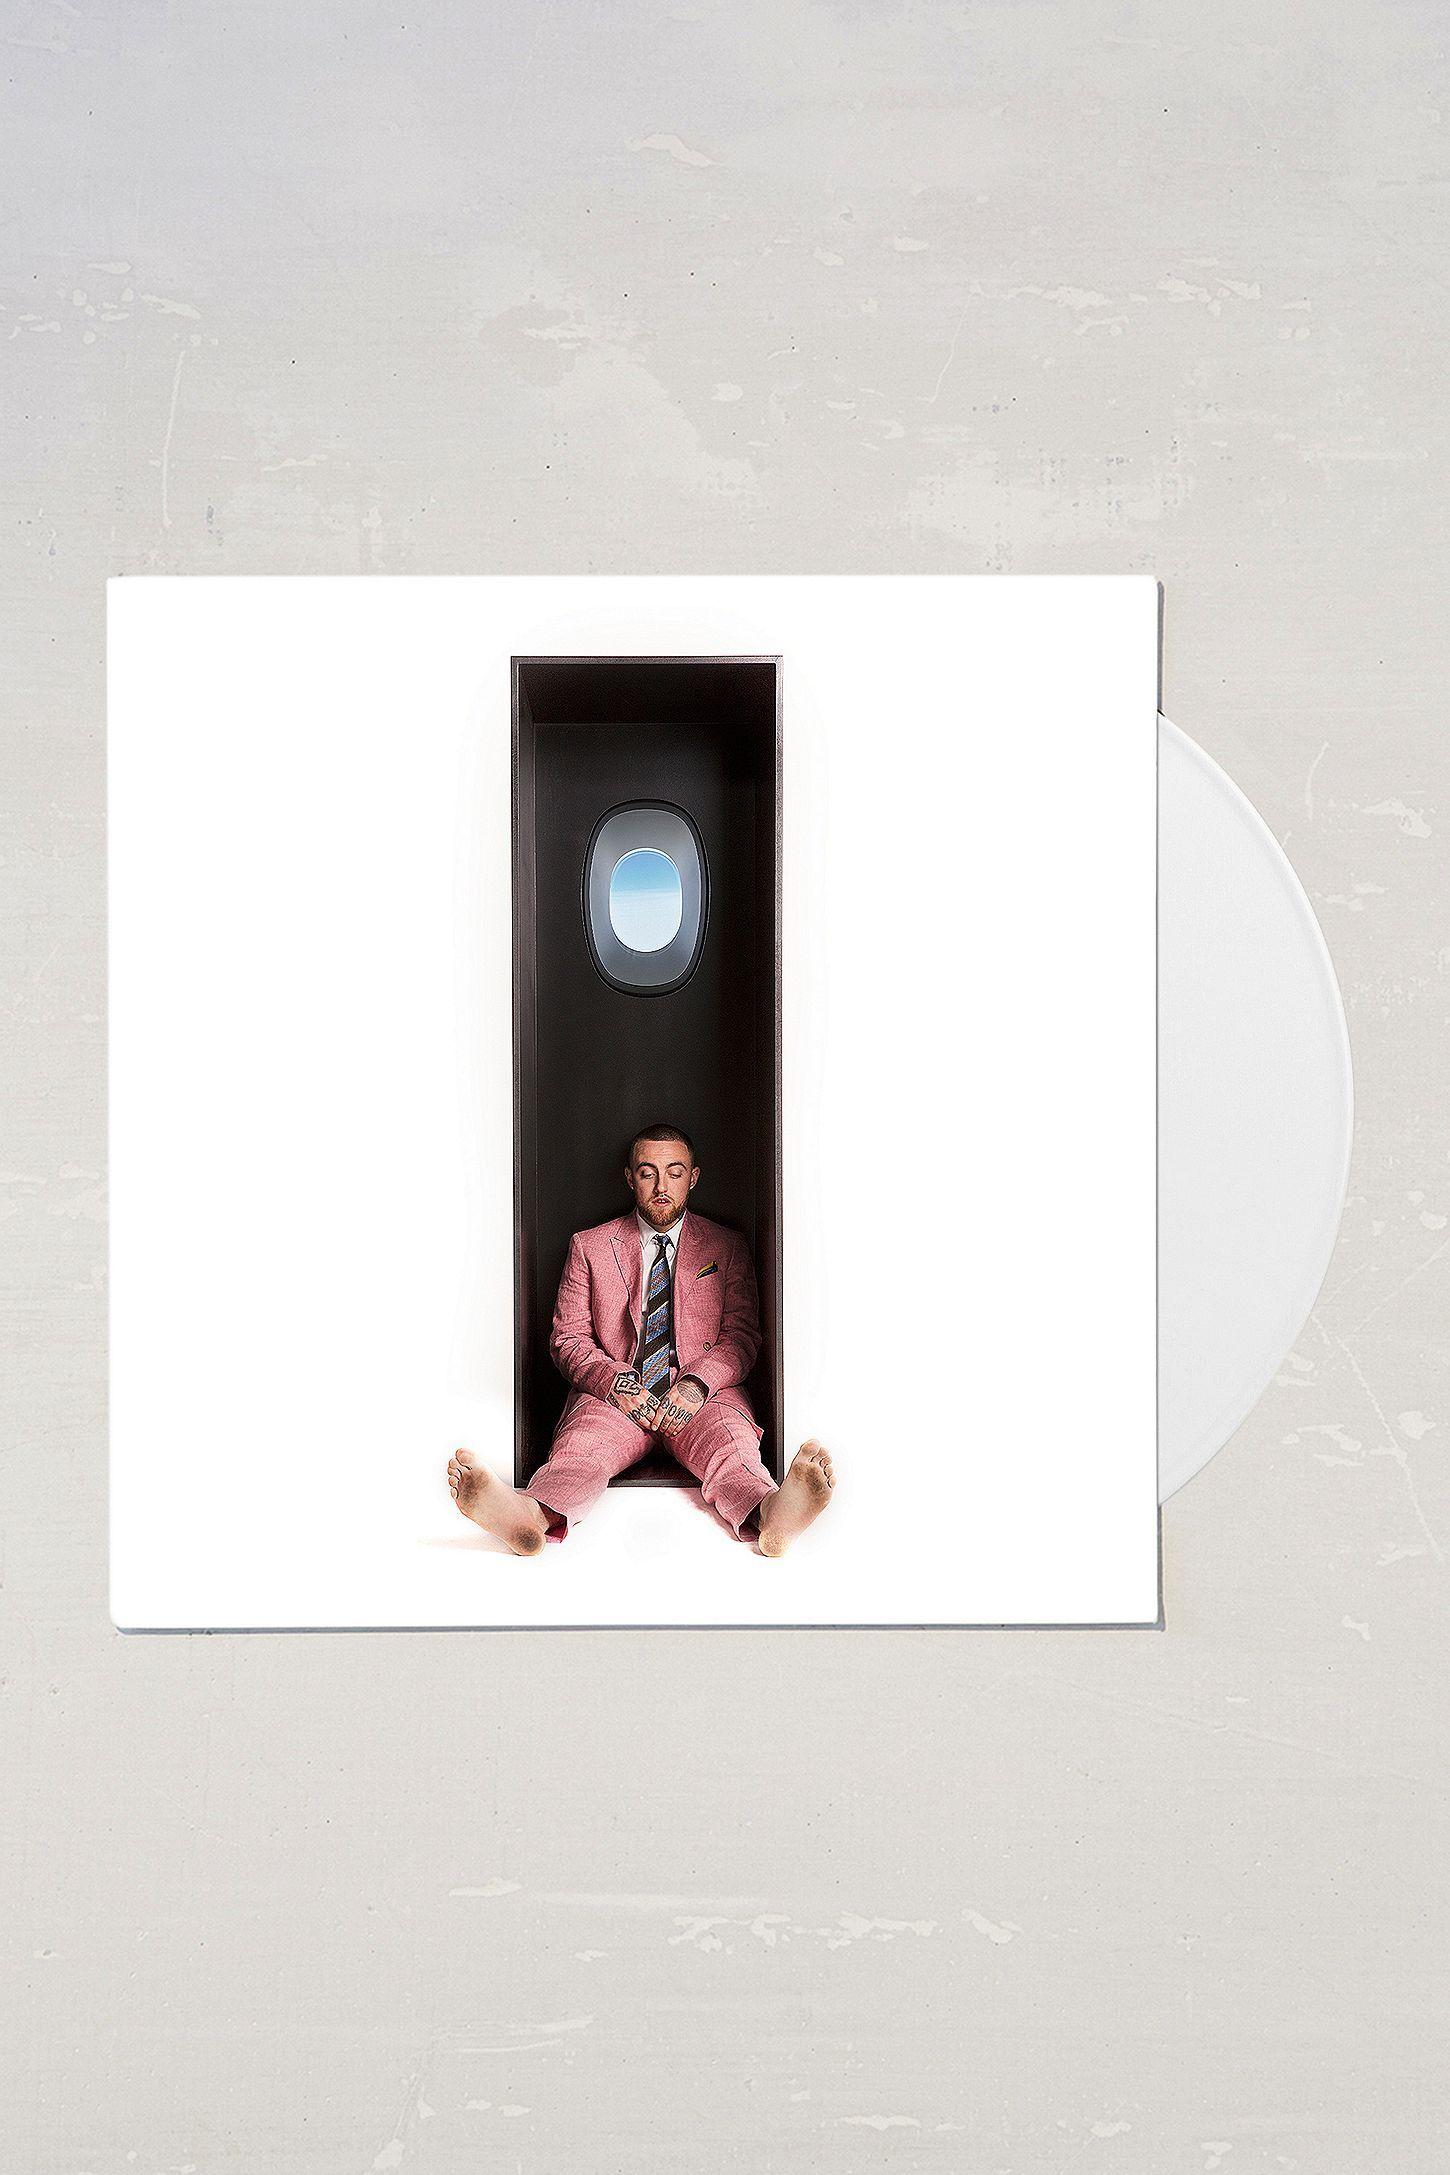 Mac miller swimming 2xlp mac miller vinyl music